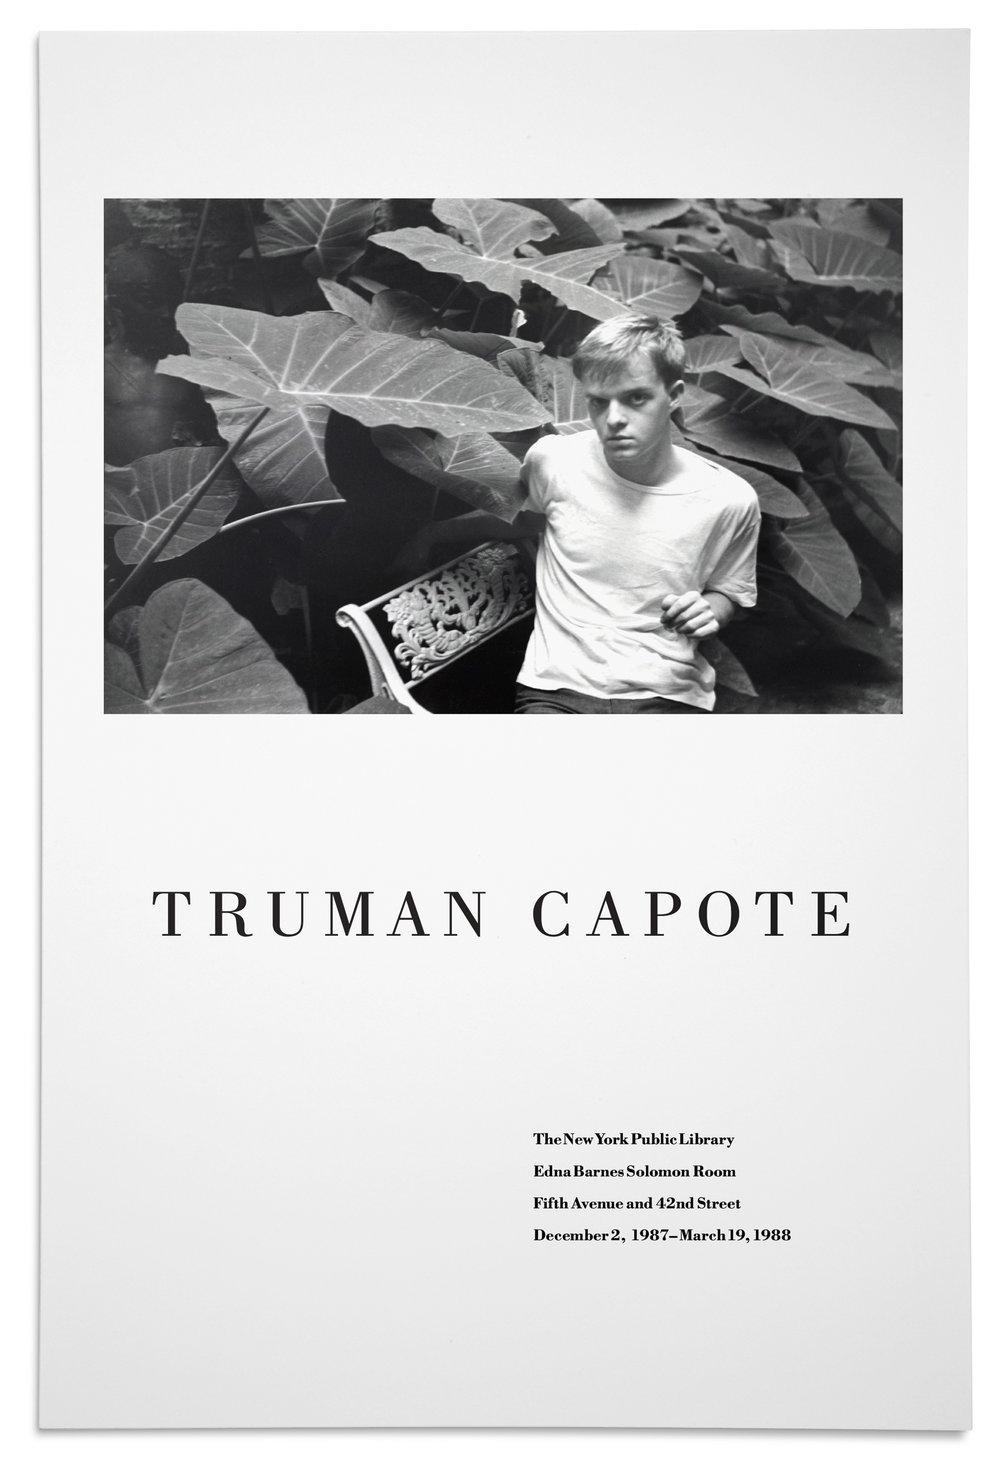 Truman-Capote-NYPL.jpg